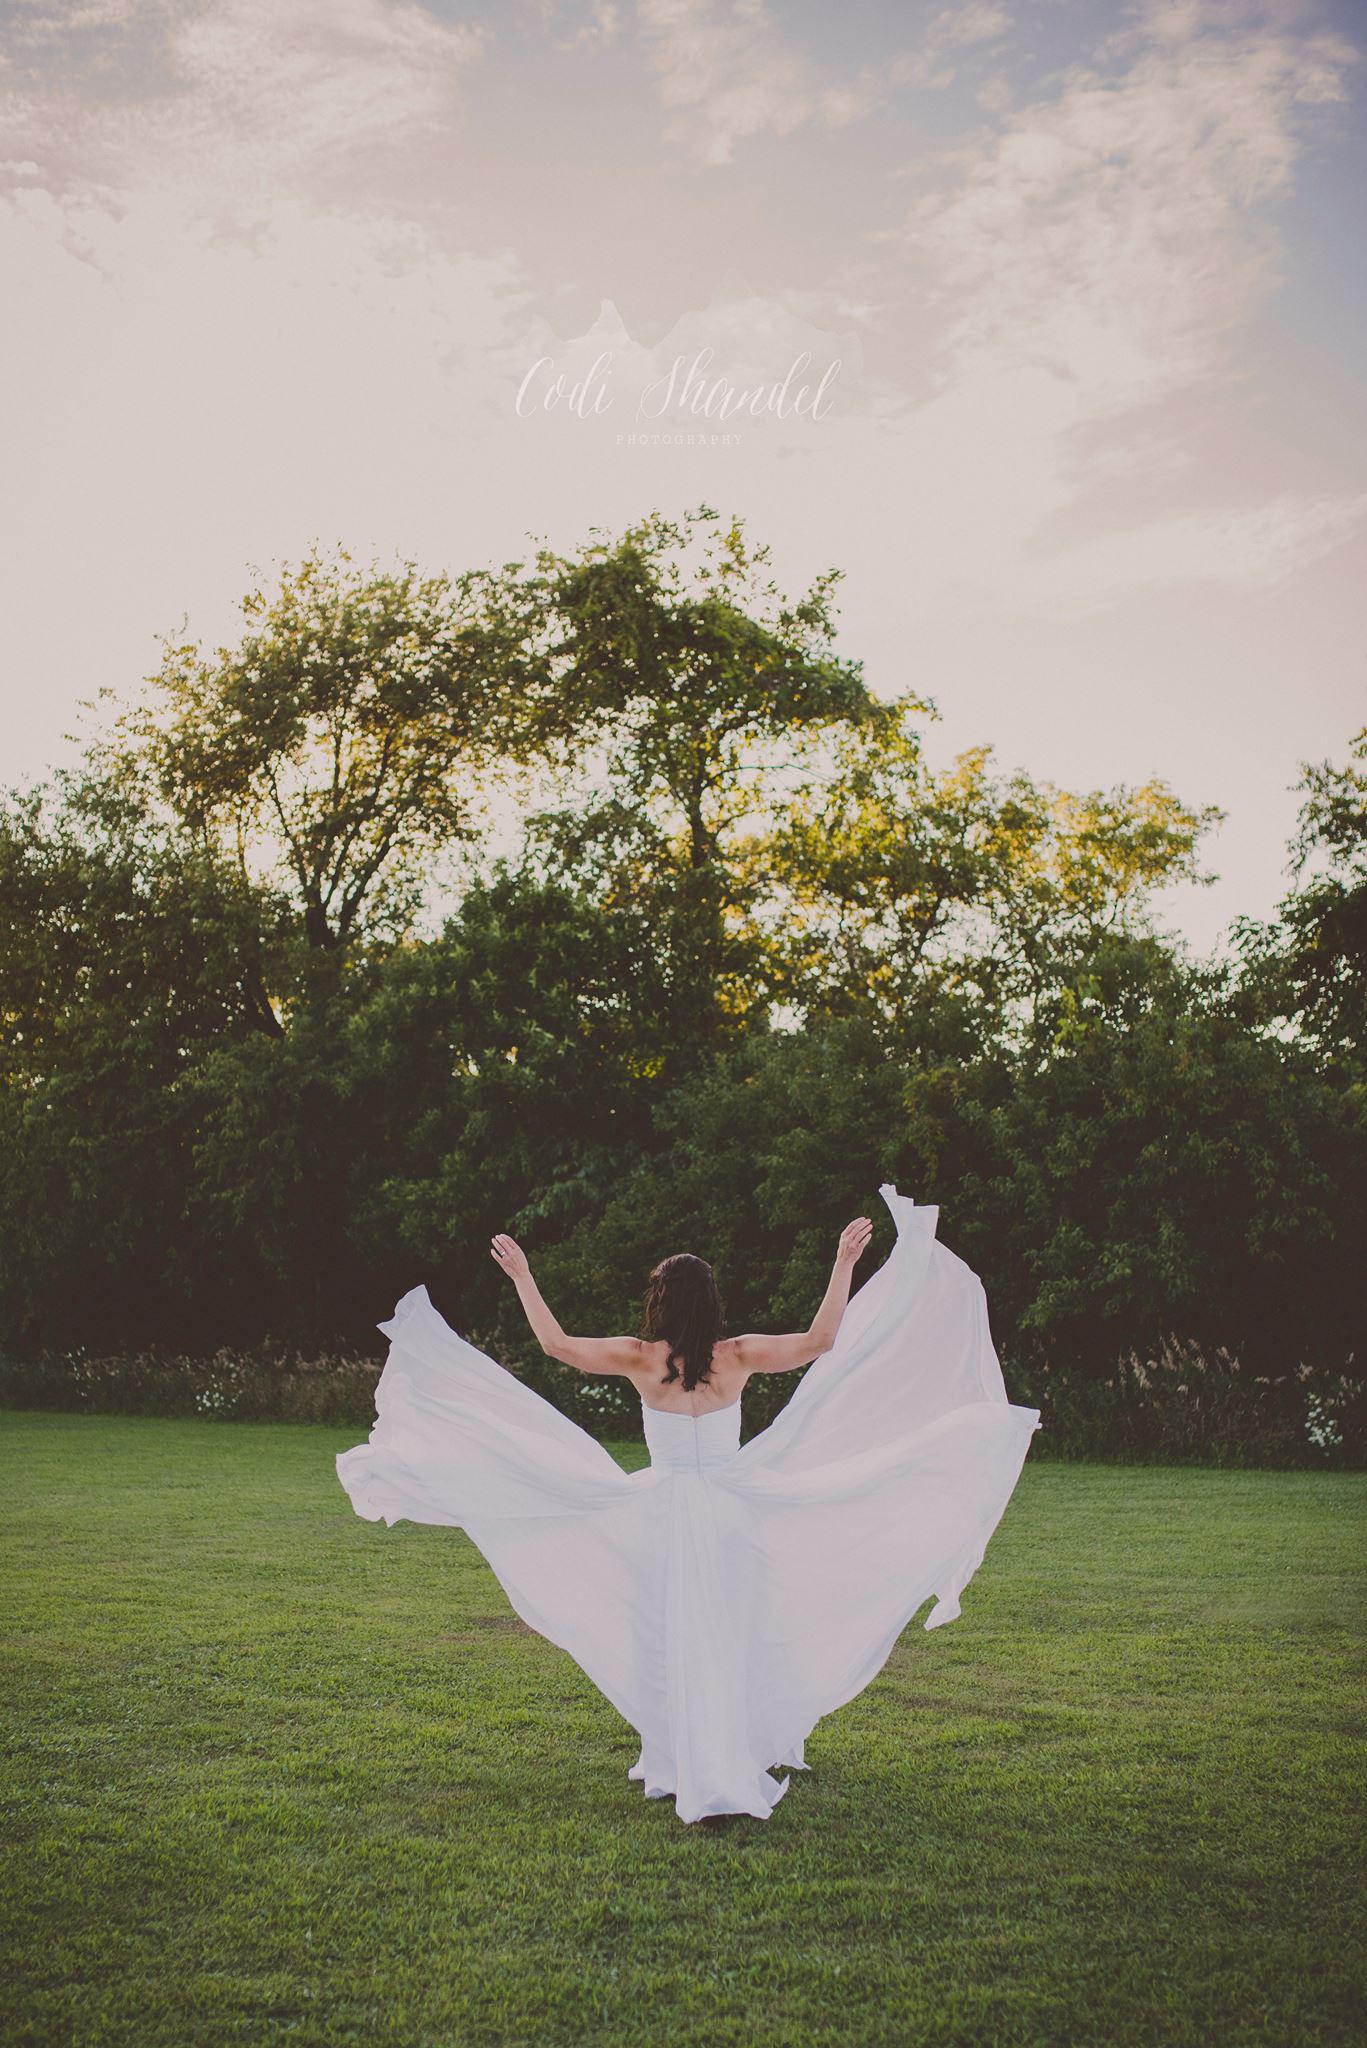 codi-shandel-photography-wedding